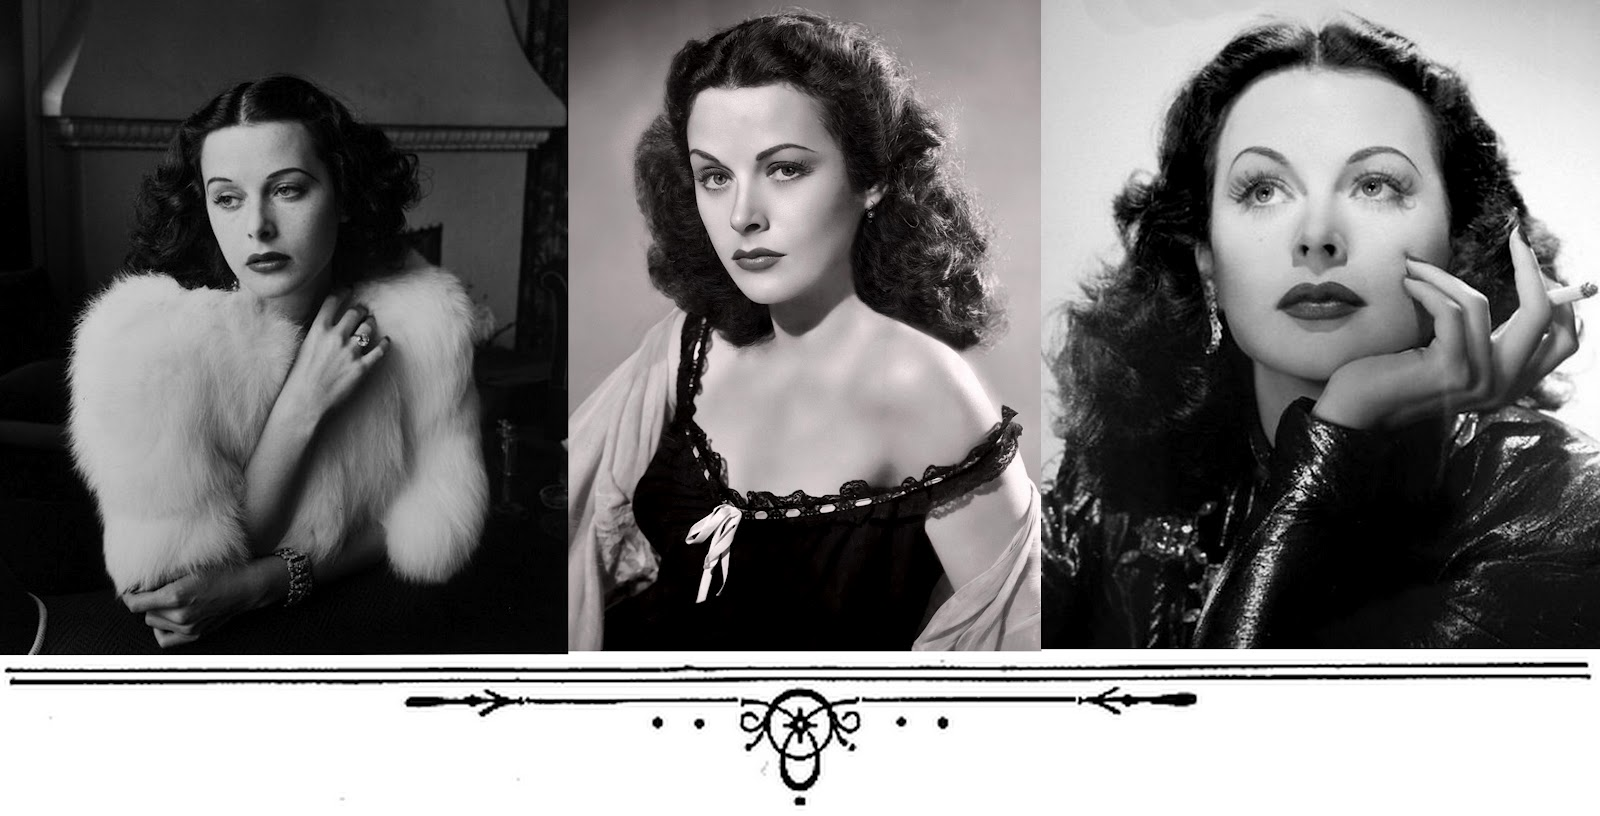 http://3.bp.blogspot.com/-5_sS_h6MSsc/T2_rHnsYMyI/AAAAAAAAB58/CR6F_Ghy7Bk/s1600/Hedy+Lamarr+Vintage+Retro+Hollywood+Rag+Curls+Hair+Inspiration.jpg